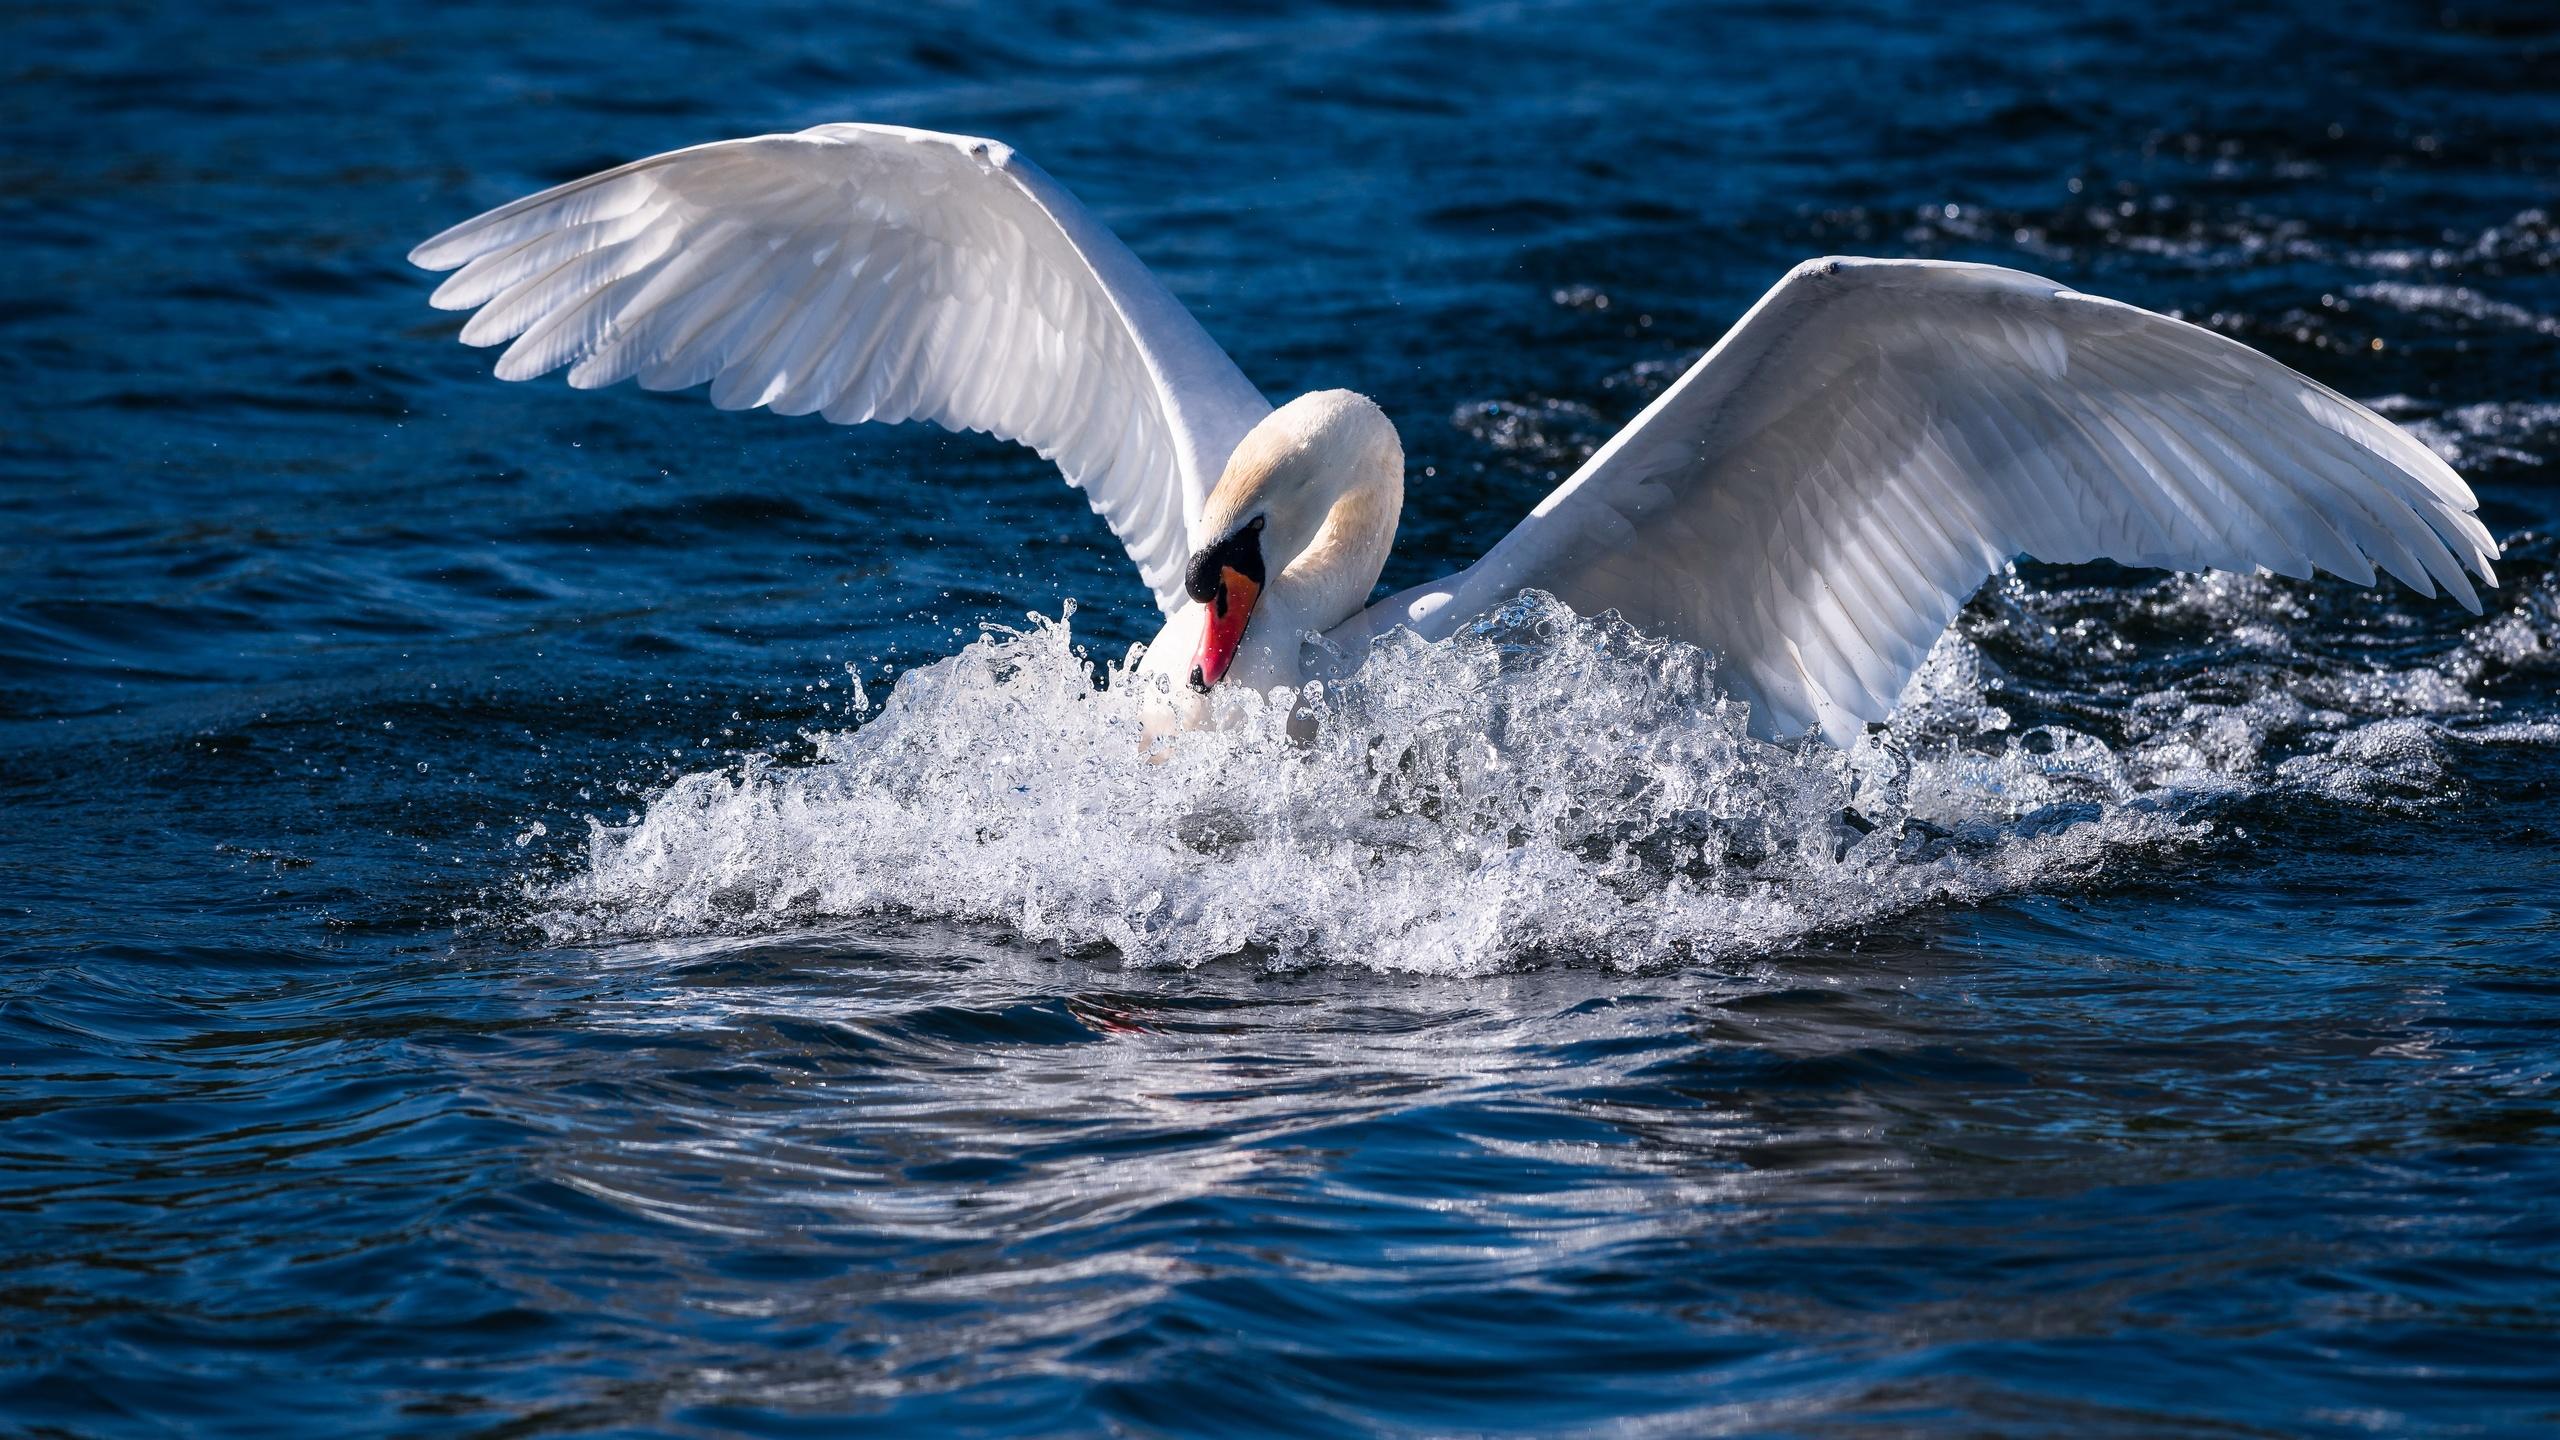 птицы мира, вода, птица, лебедь, крылья, размах, взмах, брызги